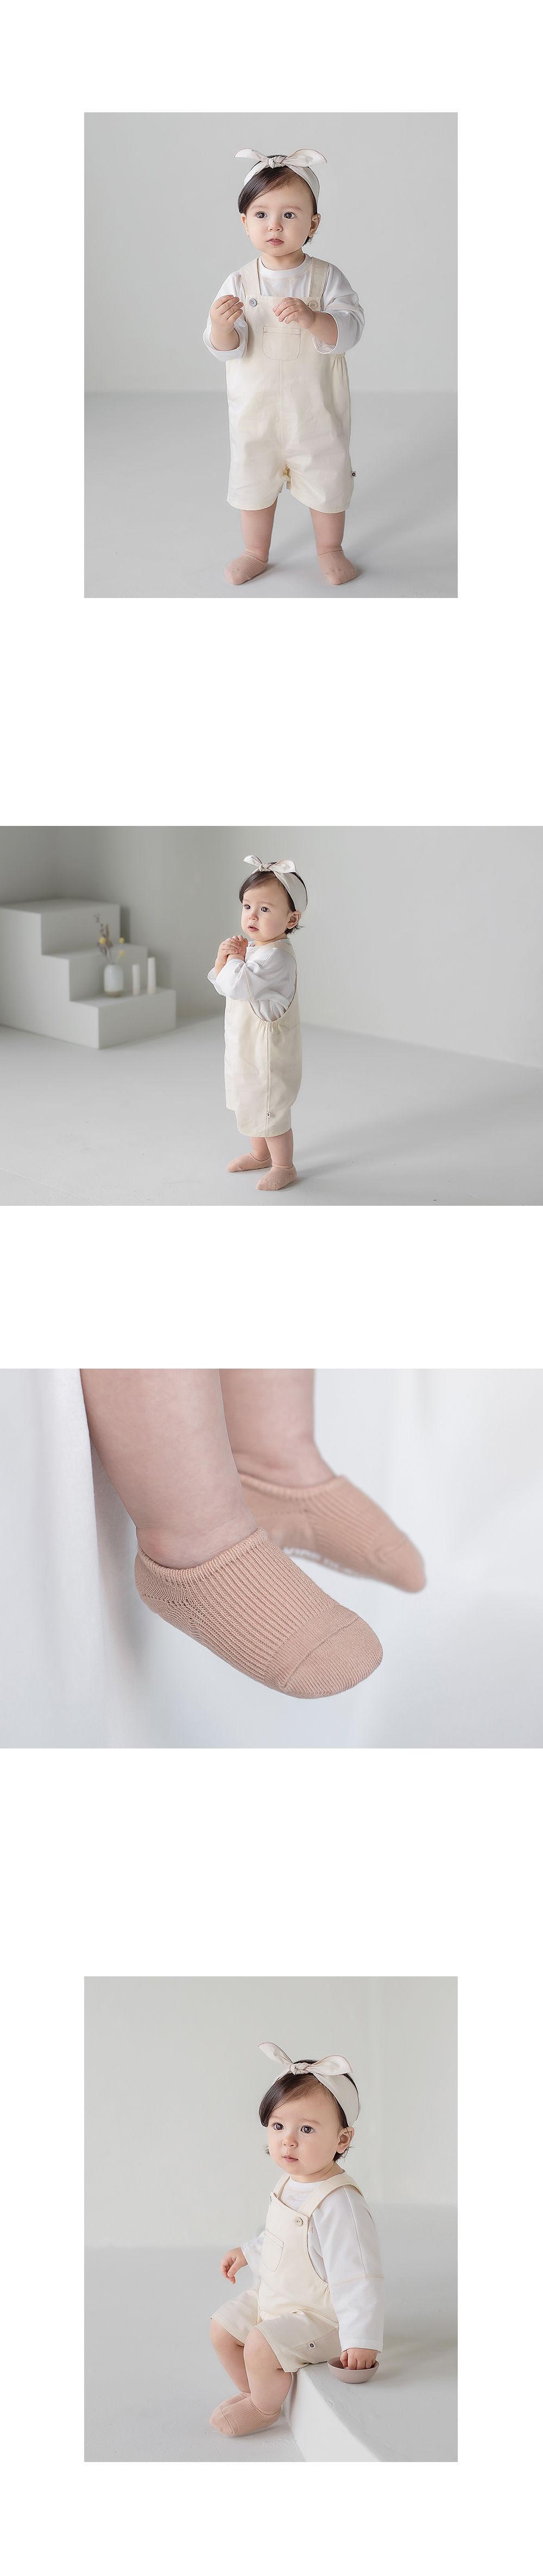 KIDS CLARA - Korean Children Fashion - #Kfashion4kids - Nest Baby Boat Socks 2-in-1 [set of 5] - 6